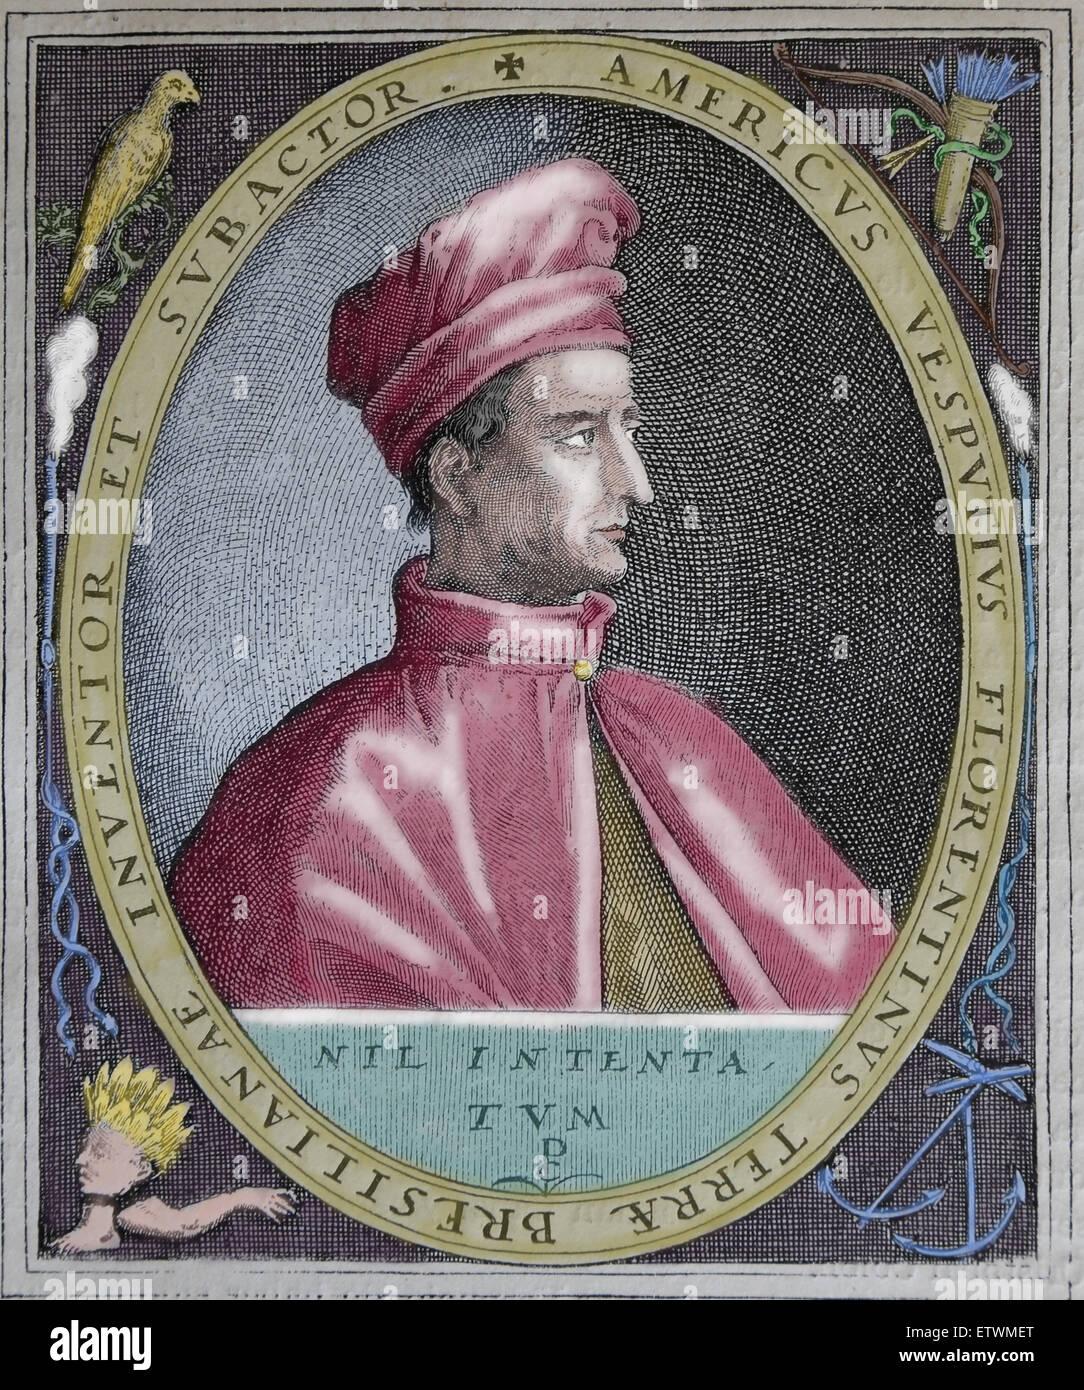 A biography of amerigo vespucci an italian explorer and navigator